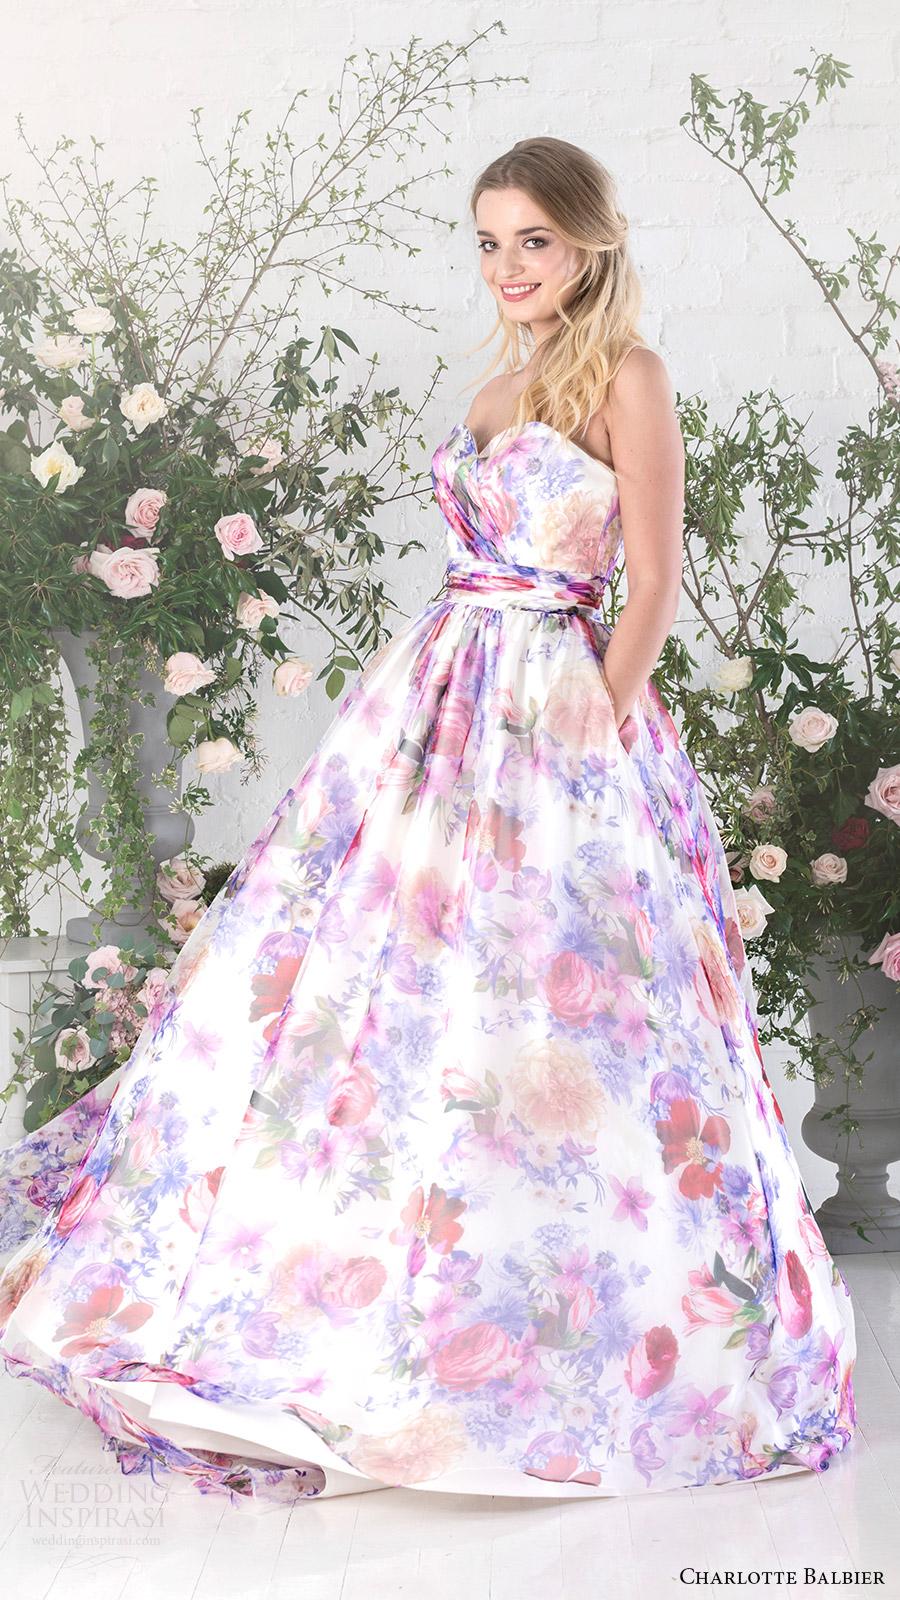 Charlotte Balbier 2017 Wedding Dresses  Untamed Love Bridal Collection  Wedding Inspirasi